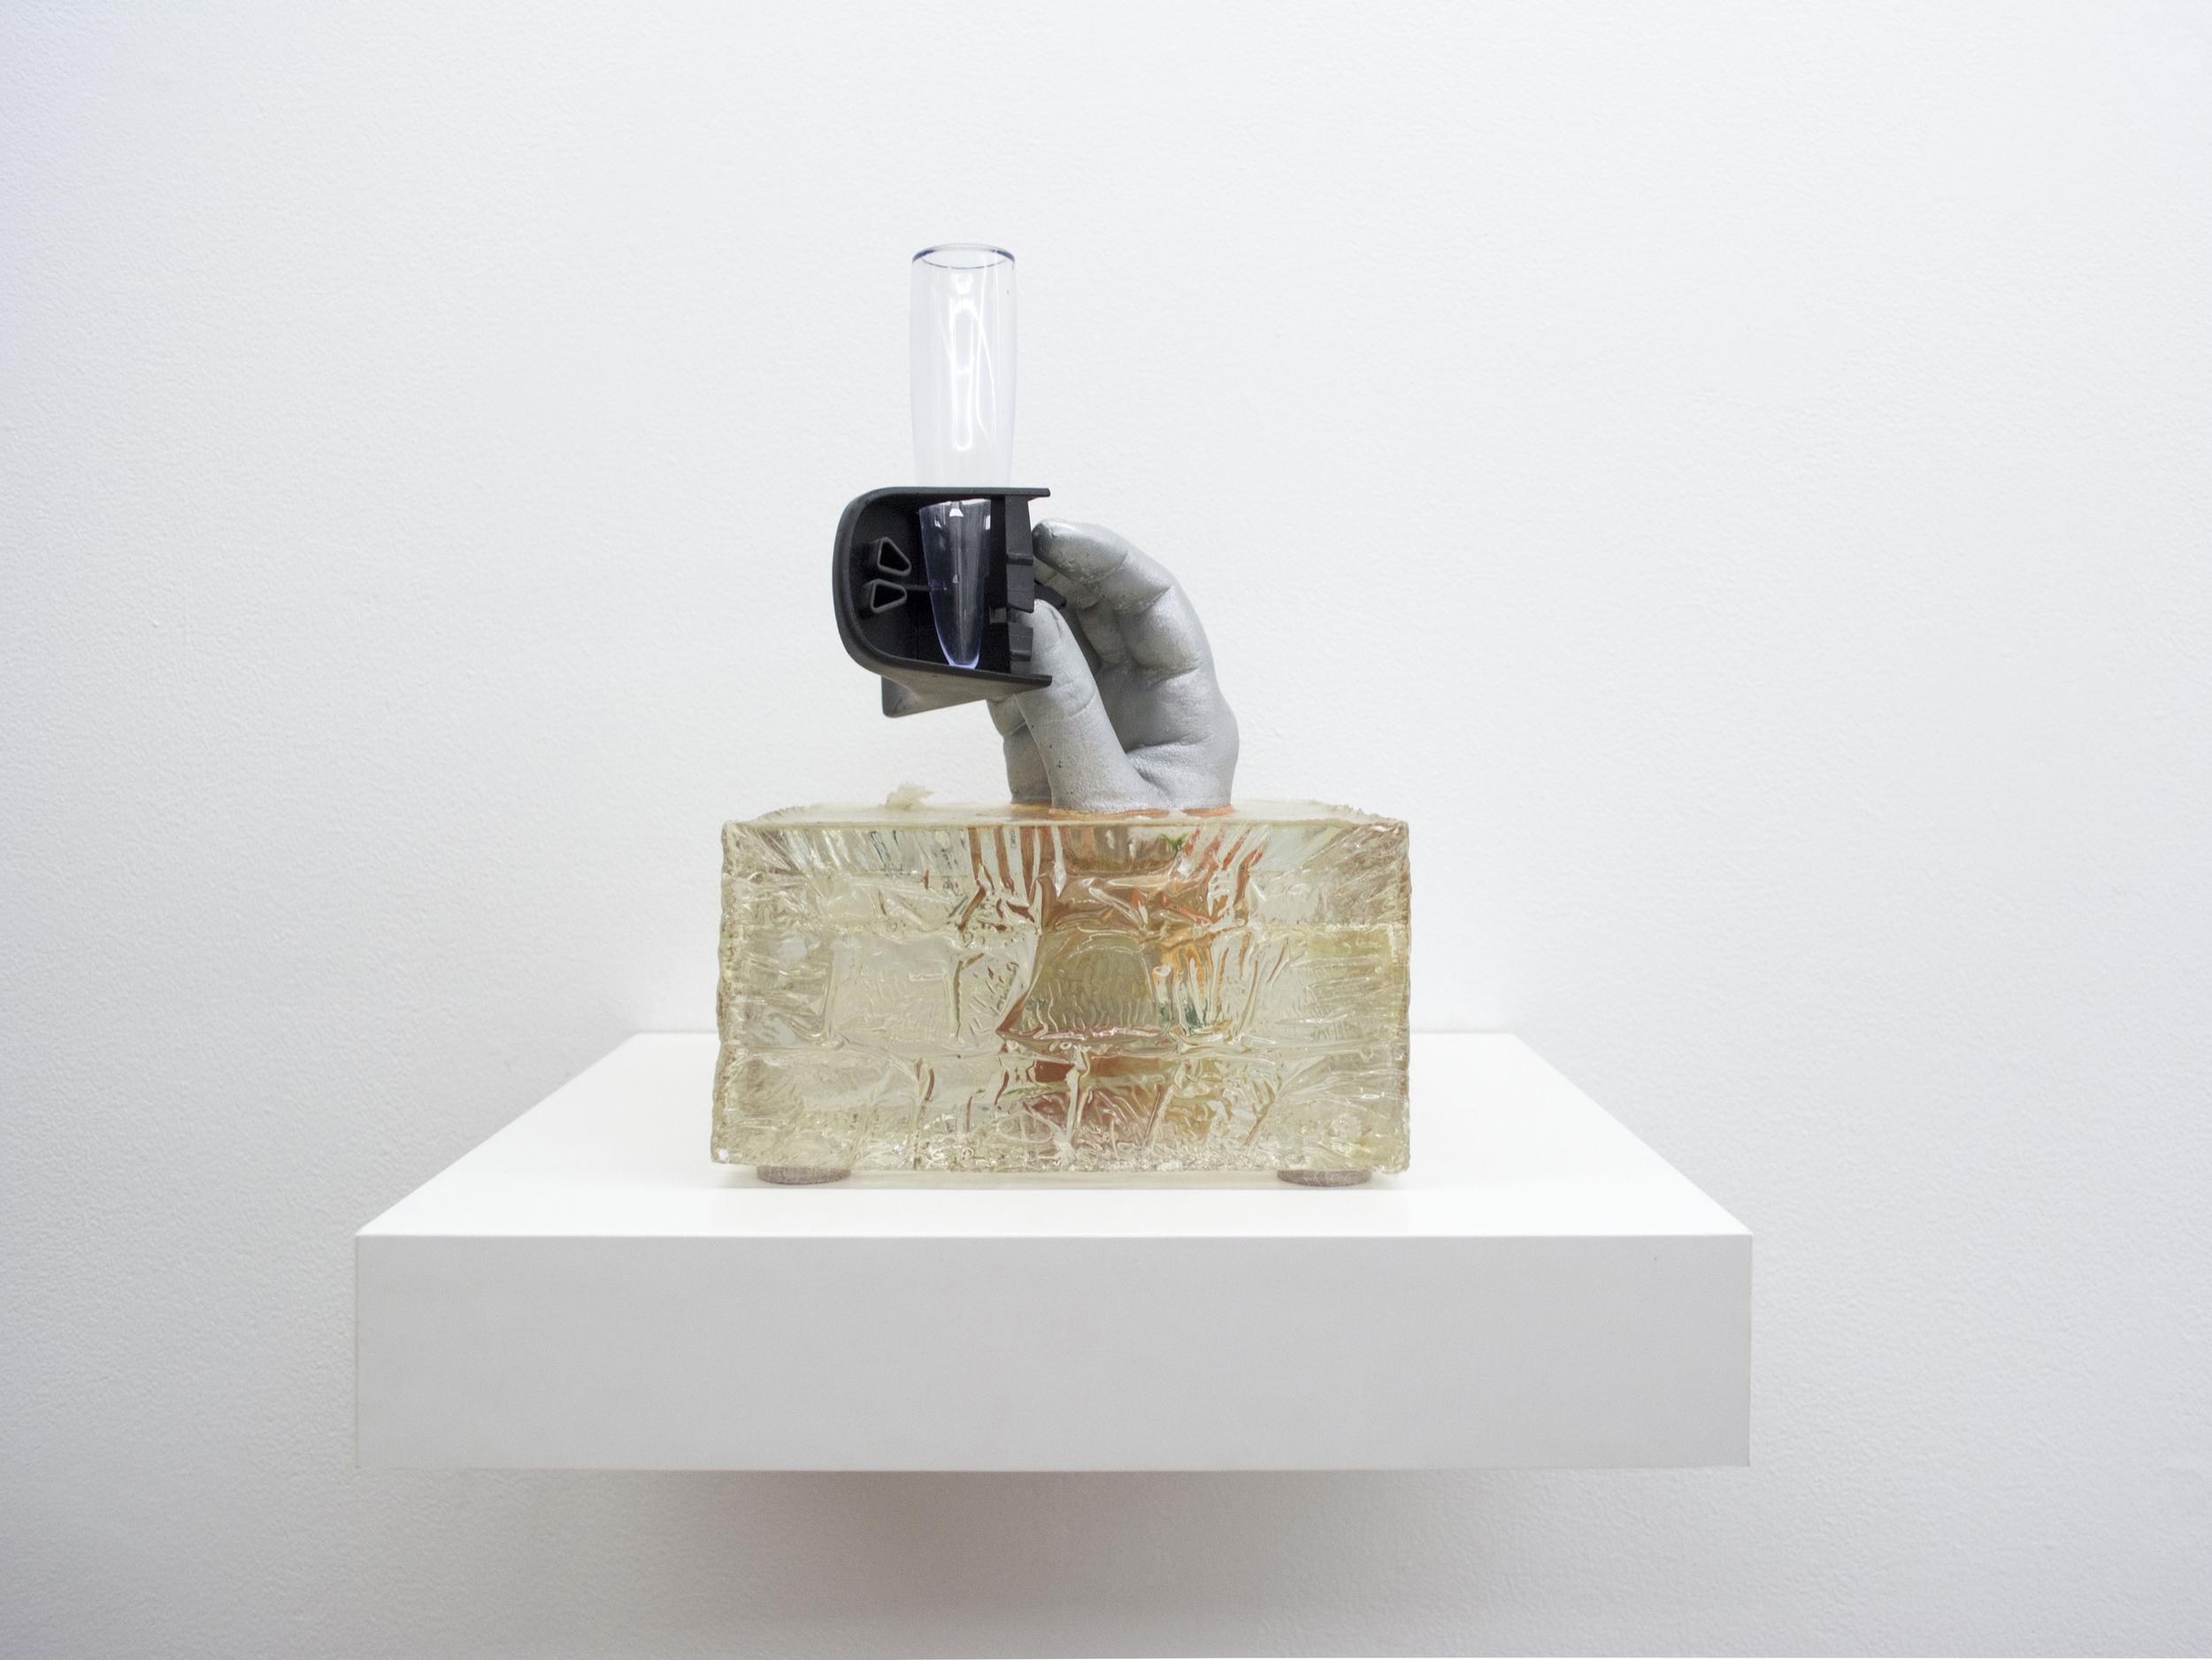 "Mia Goyette   Auf Wiedersehen, Blumenvasen  (1938-2011), 2013  Polyester resin, cast plaster, dashboard-mounting VW Beetle bud vase, silk flowers, chrome paint,8.25"" x 8.25"" x 11"""